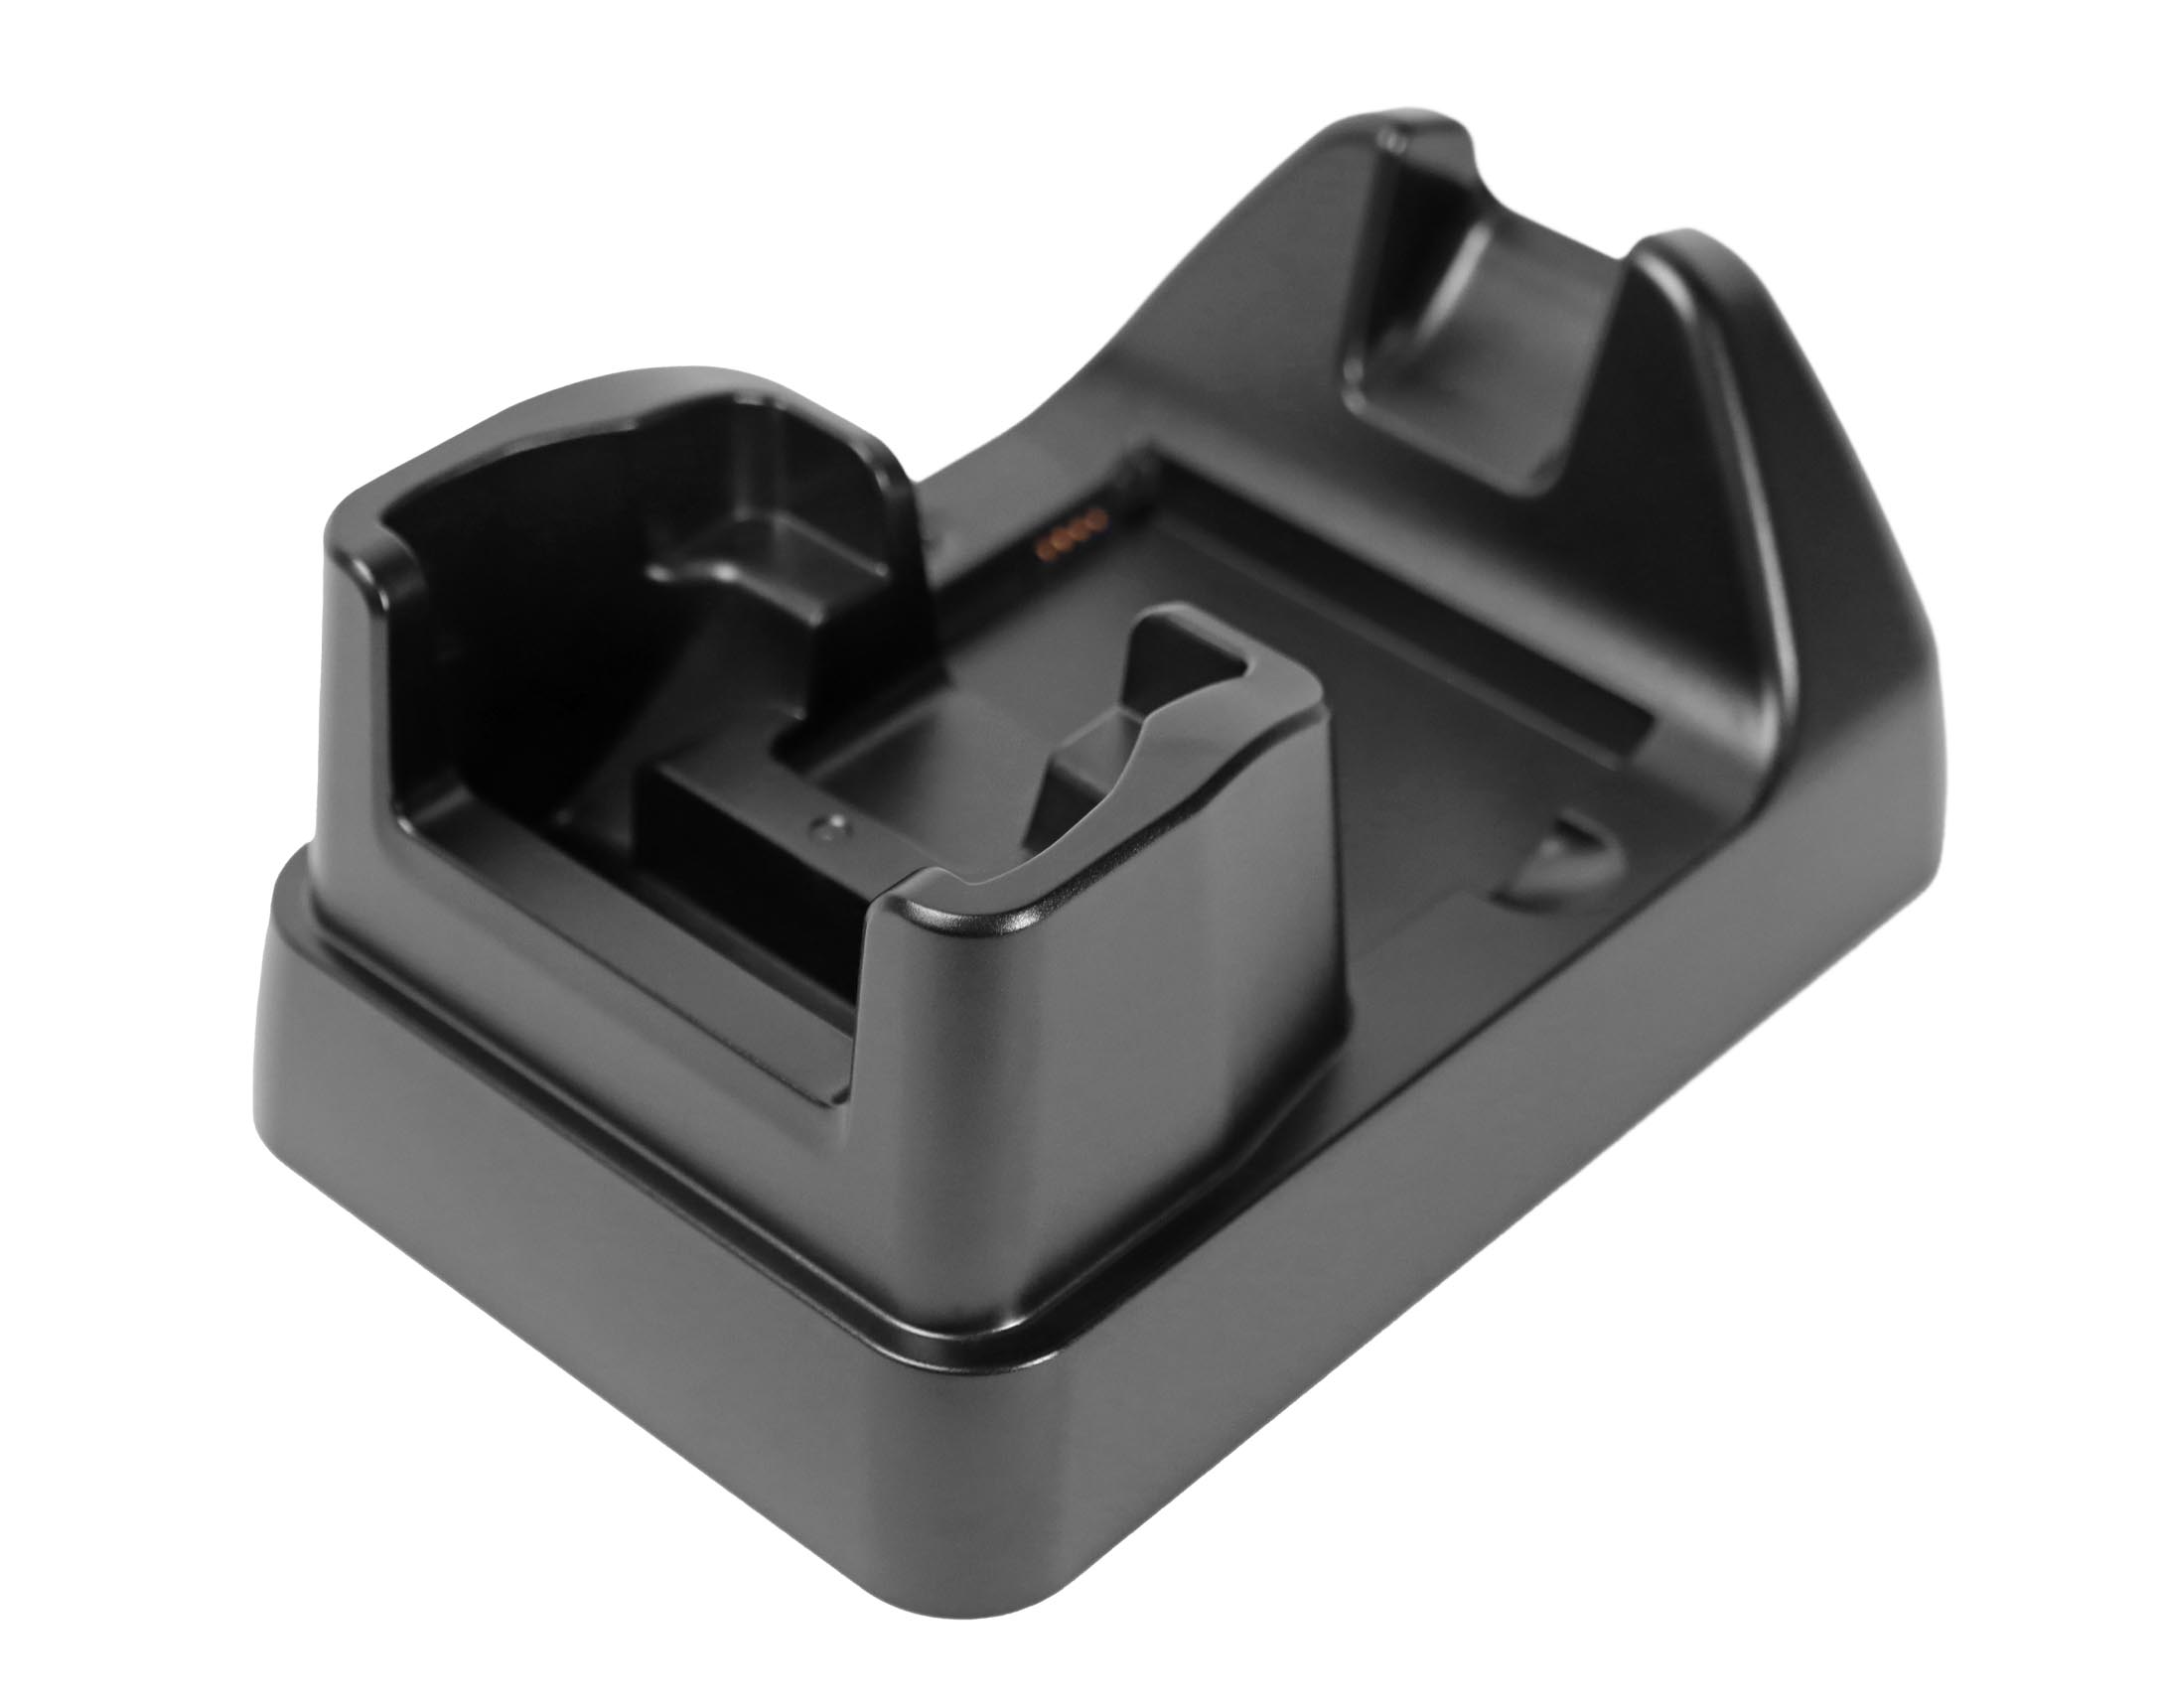 Single Slot Ethernet Cradle for Pistol Grip / RF750